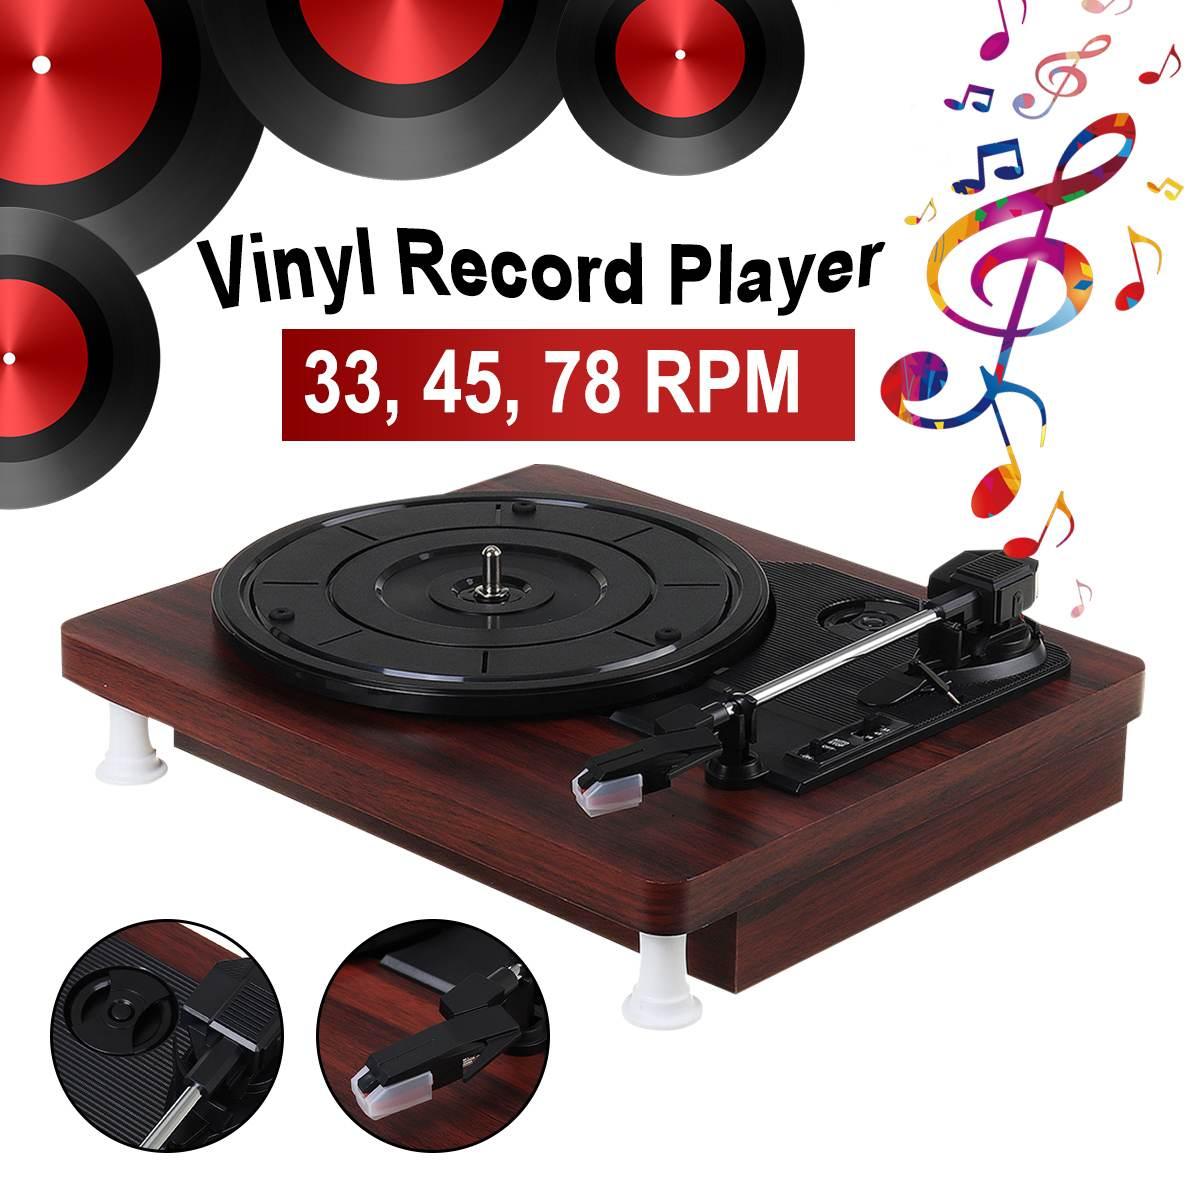 Retro Player Stereo 33 45 78 RPM LP Three Speed Vinyl Record Turntable Player Gramophone RCA R/L PH 2.0 Stereo